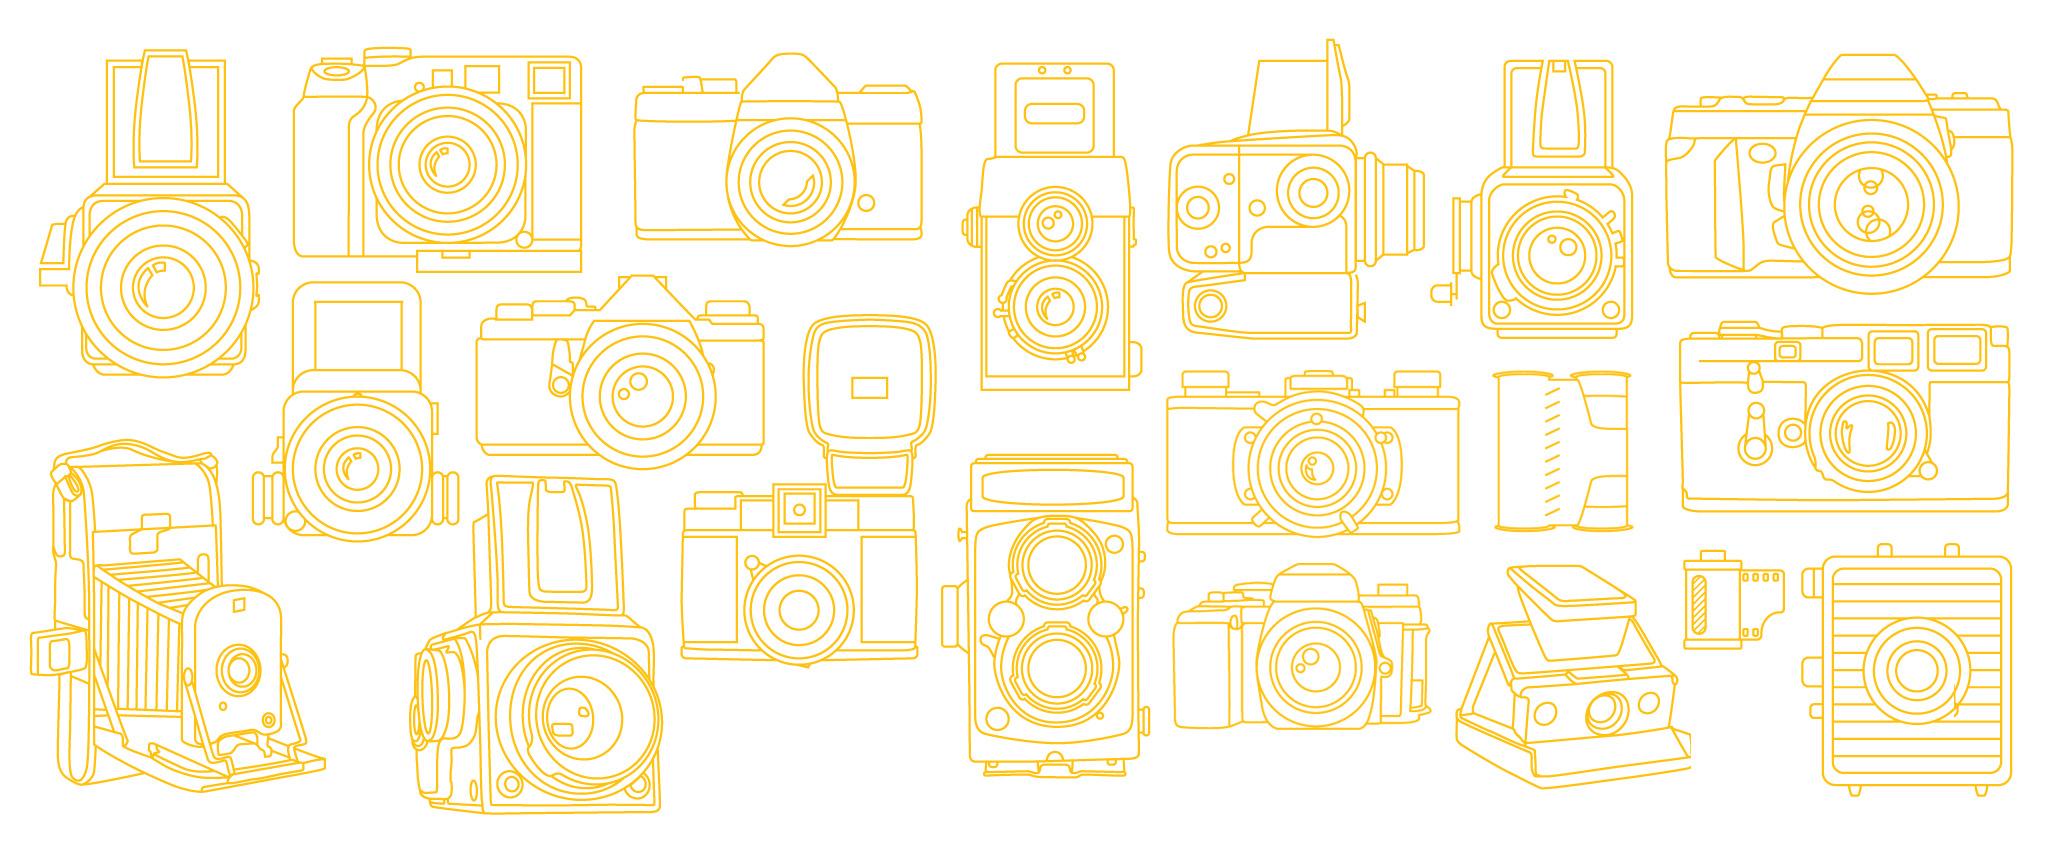 Mono width, single line width, line art camera illustrations of old film cameras such as single lens reflex, canisters, polaroids, rolleiflex, hasselblad, pentax, minolta, medium format, leica, lomo diana and more.